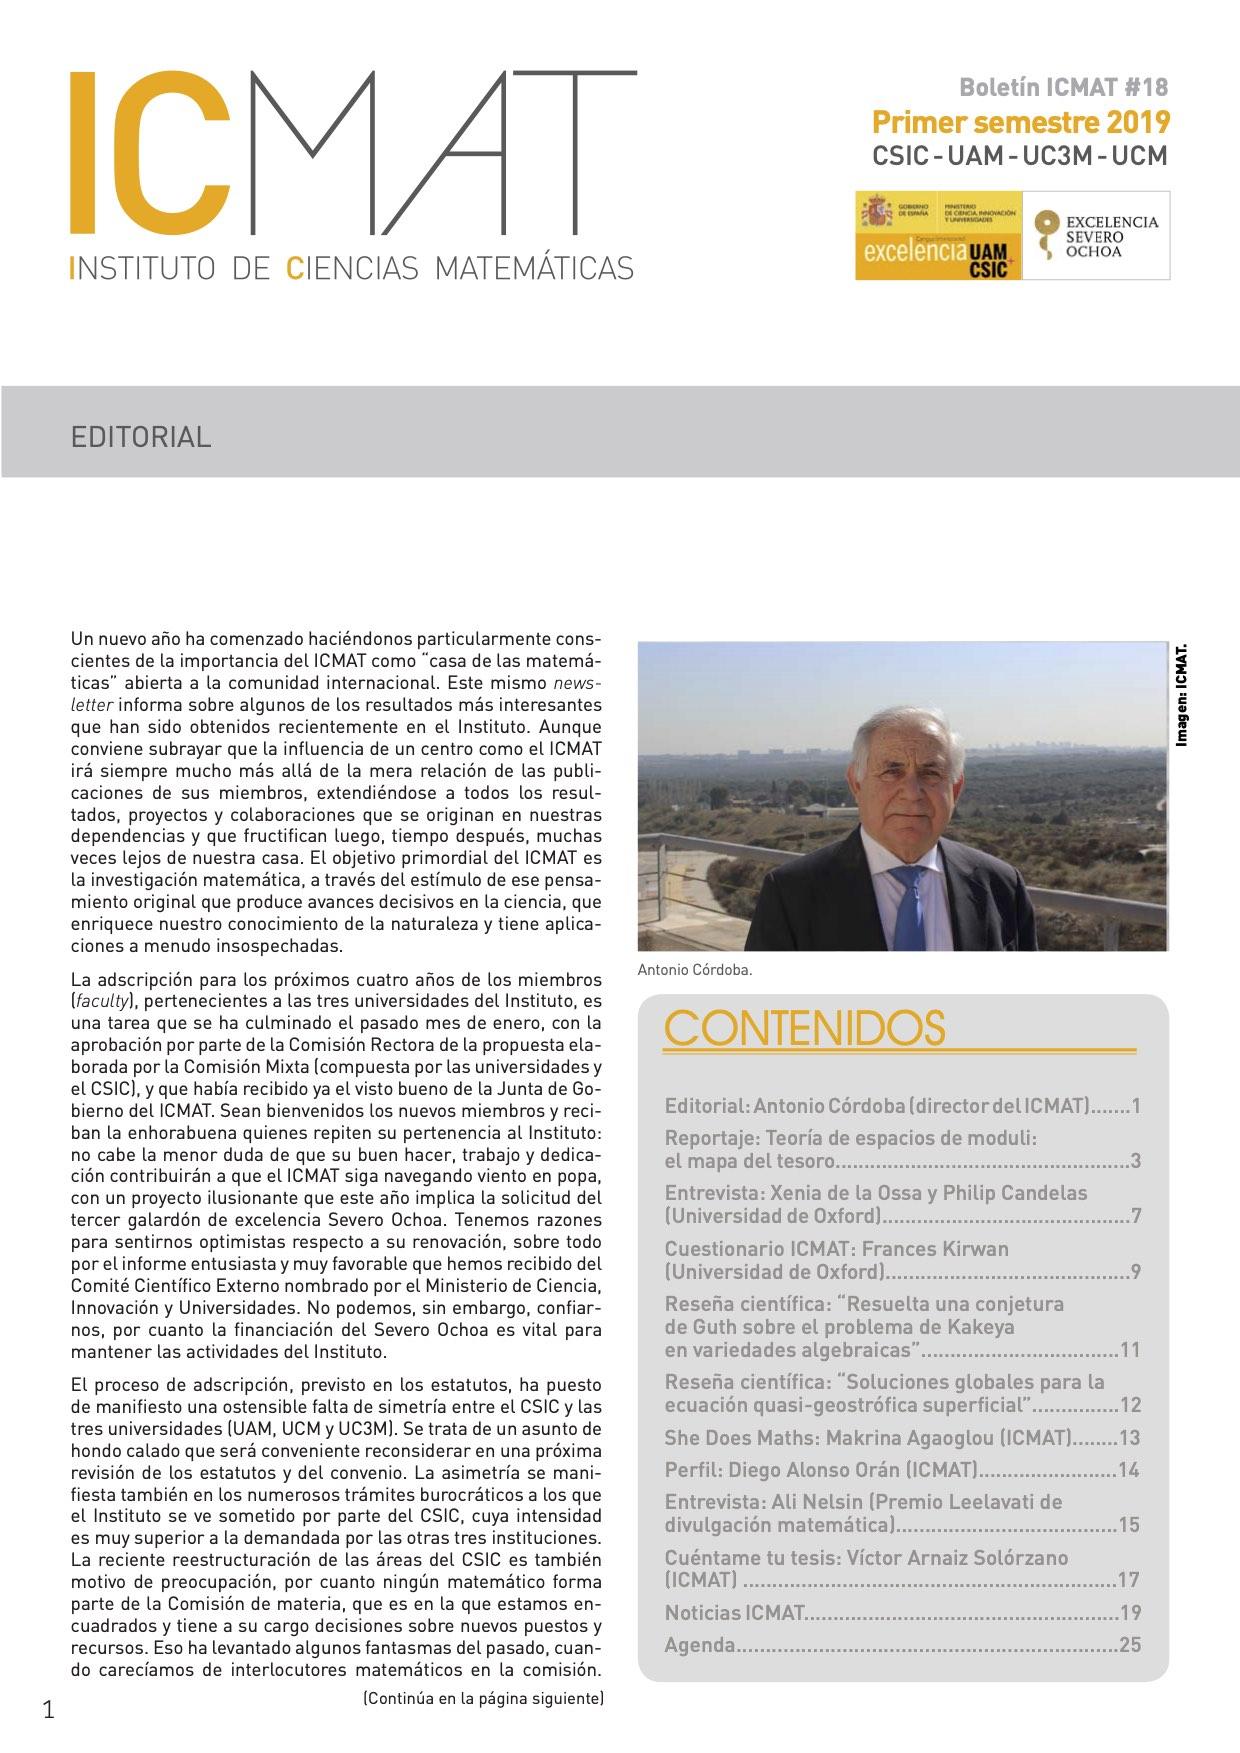 Boletín18 20191S espanol